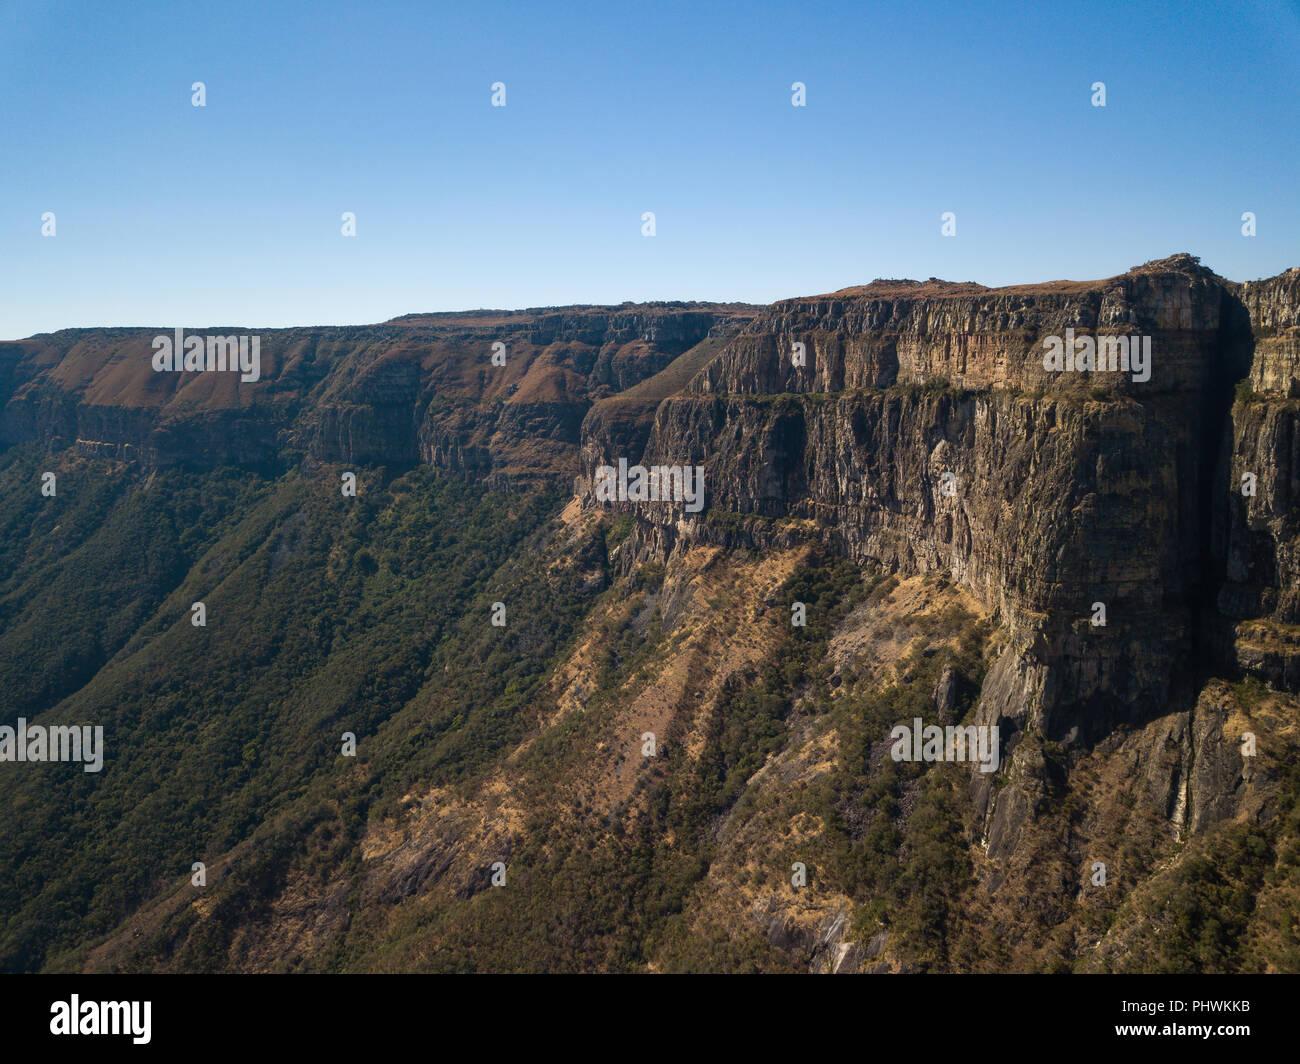 Tundavala escarpment, Huila Province, Lubango, Angola - Stock Image